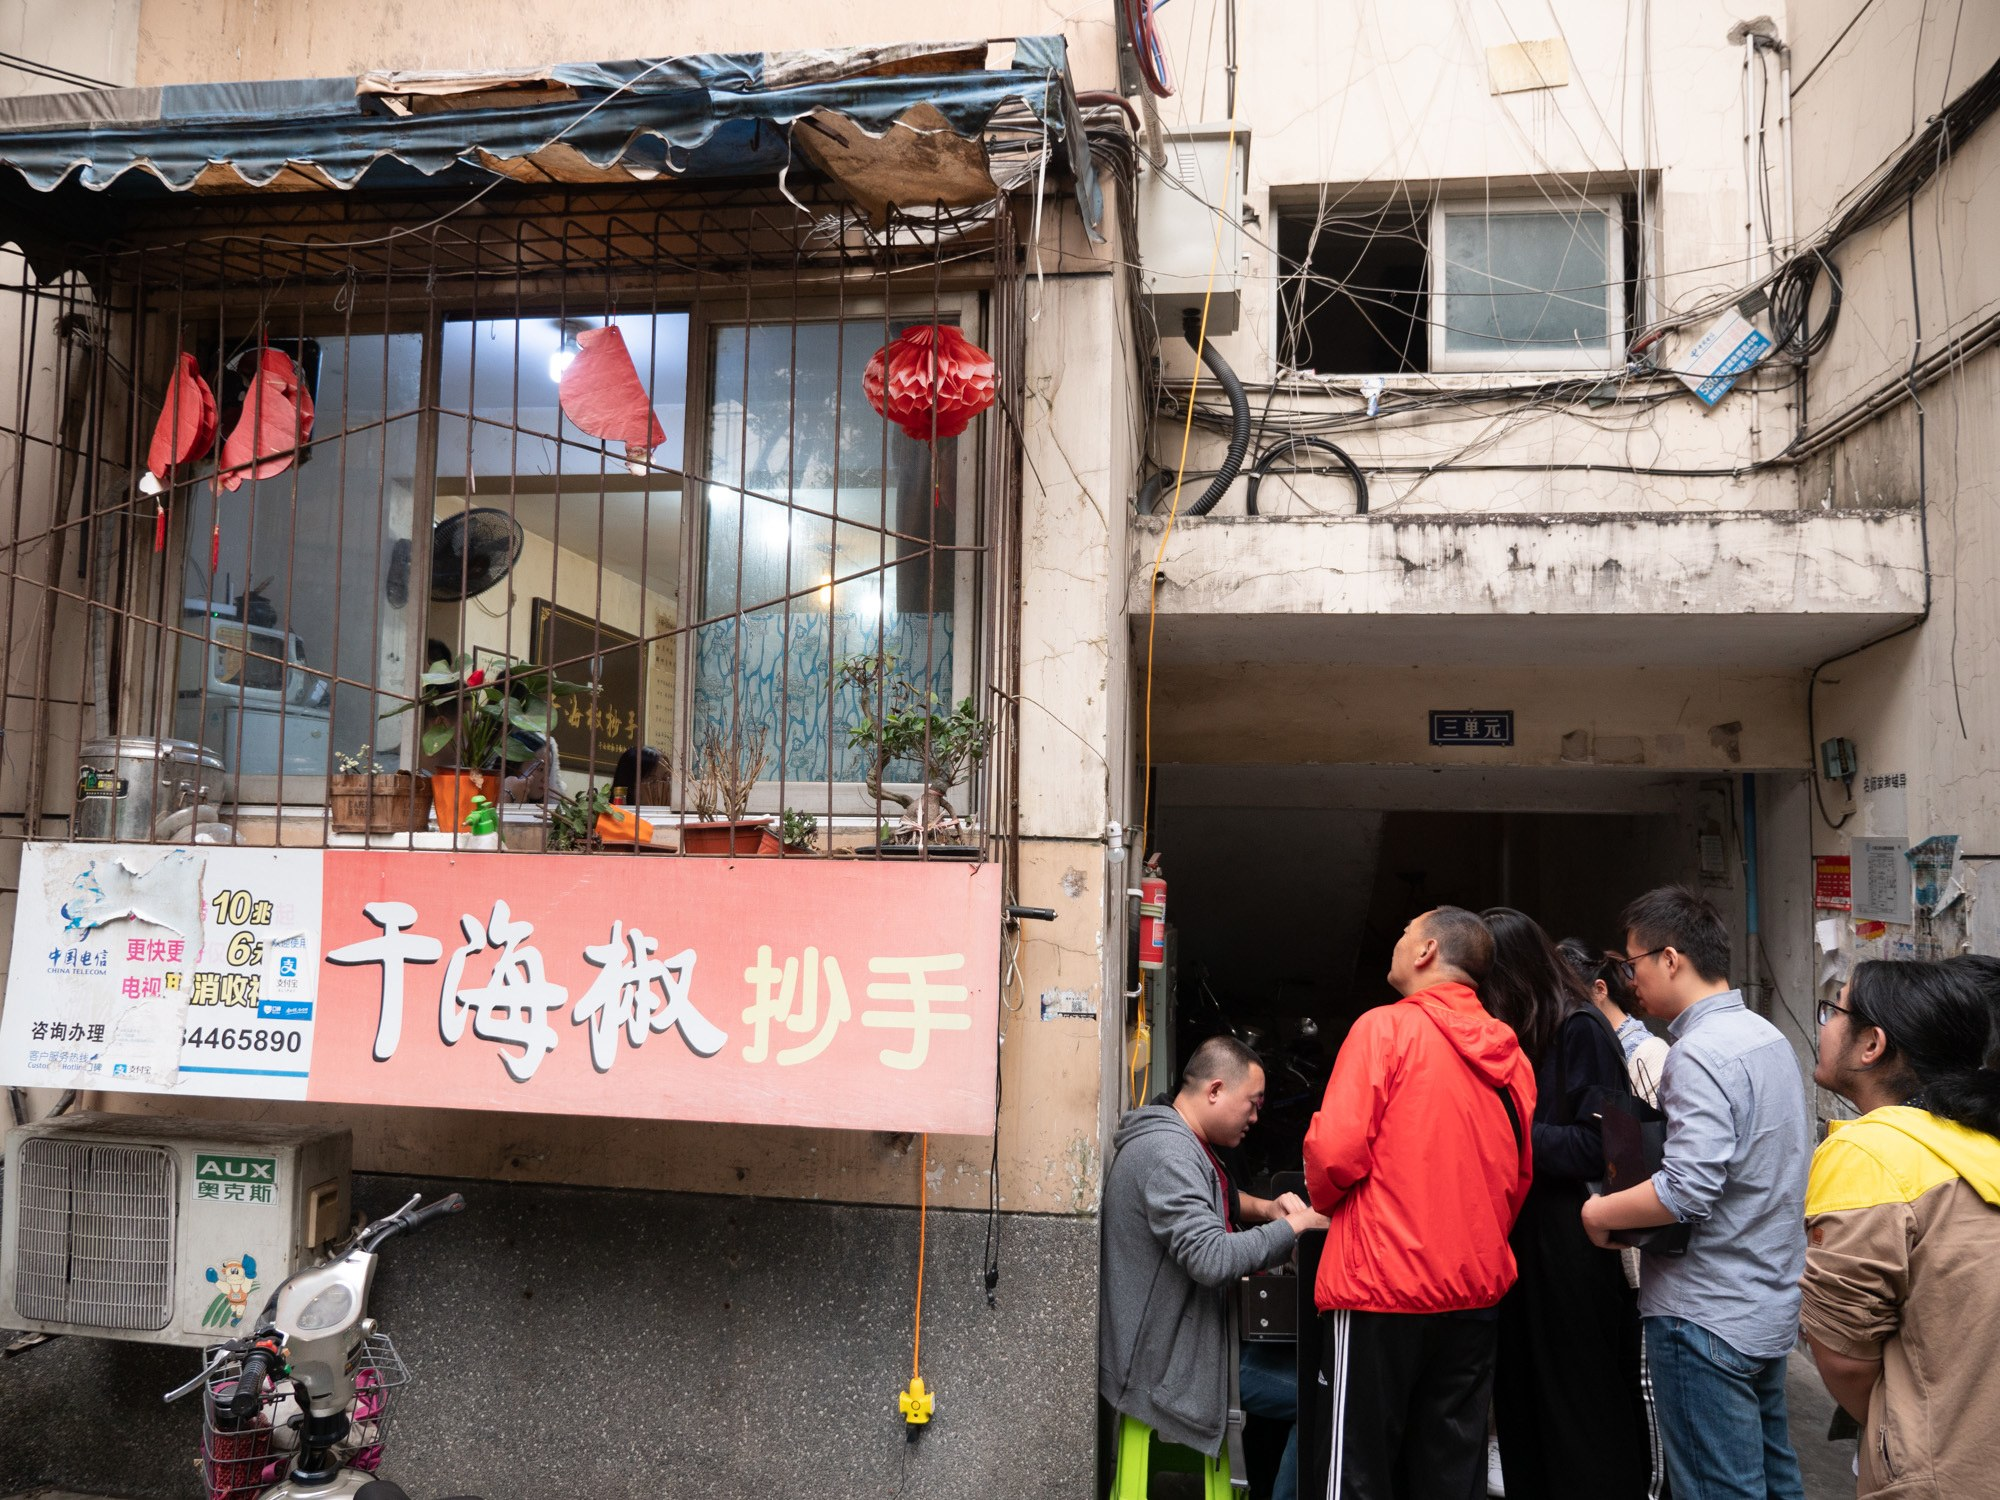 One of the best wonton restaurants in Chengdu